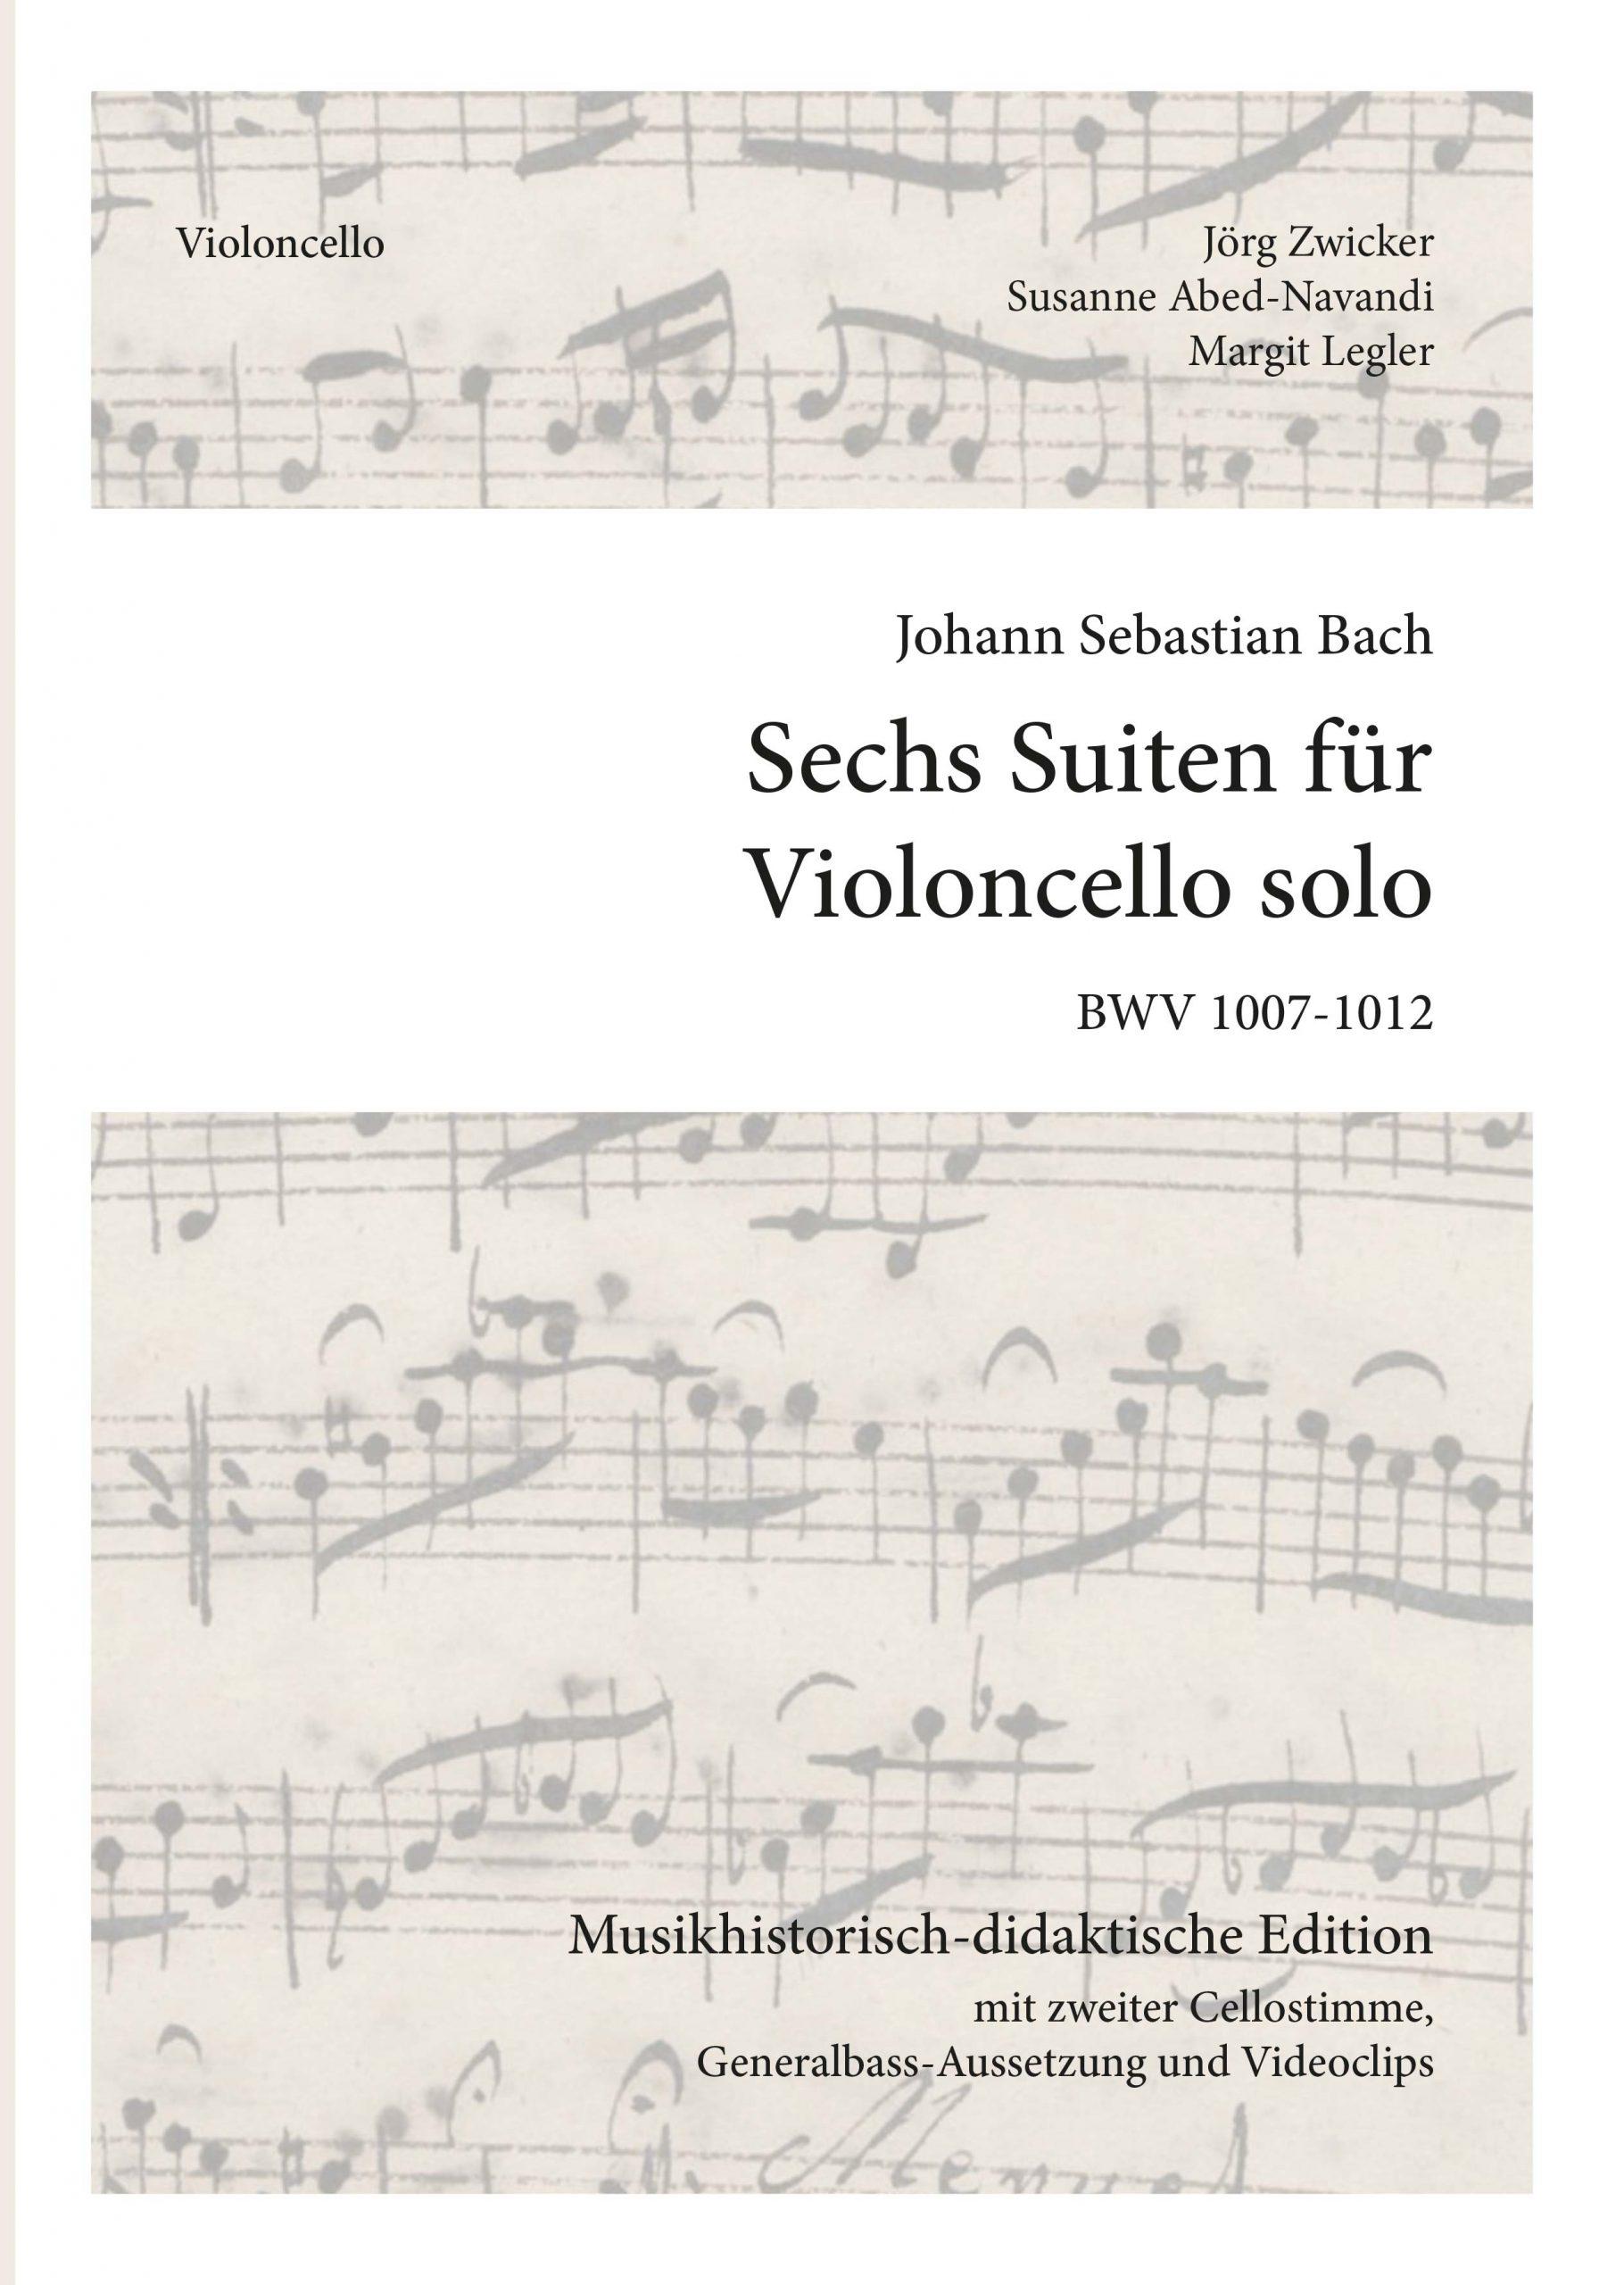 Neuerscheinung: Bach Edition